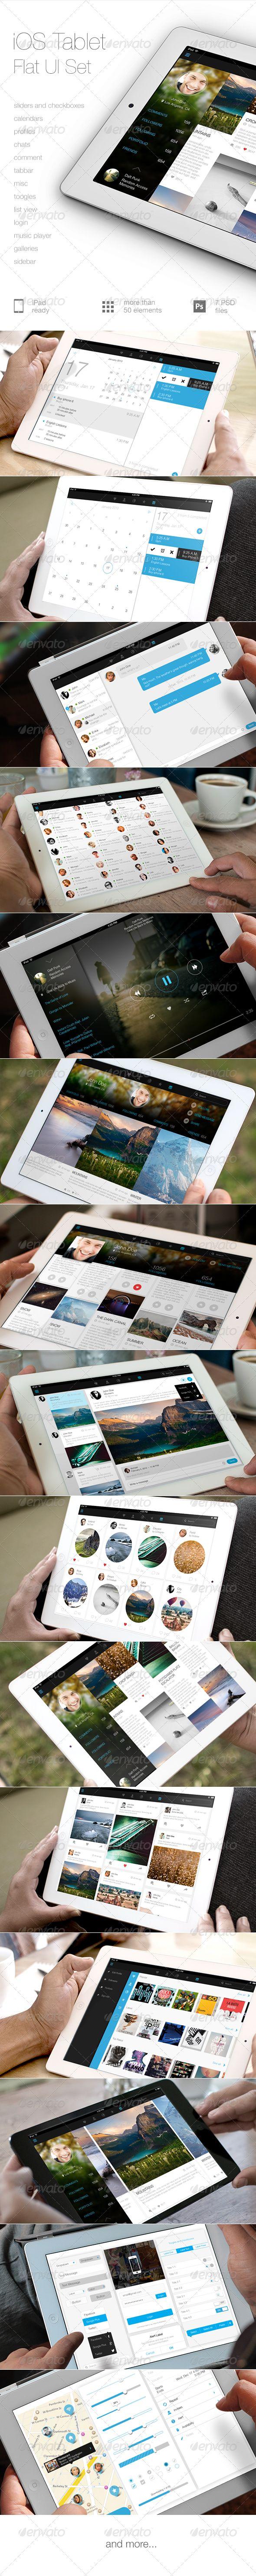 iOS Tablet Flat UI Set - User Interfaces Web Elements